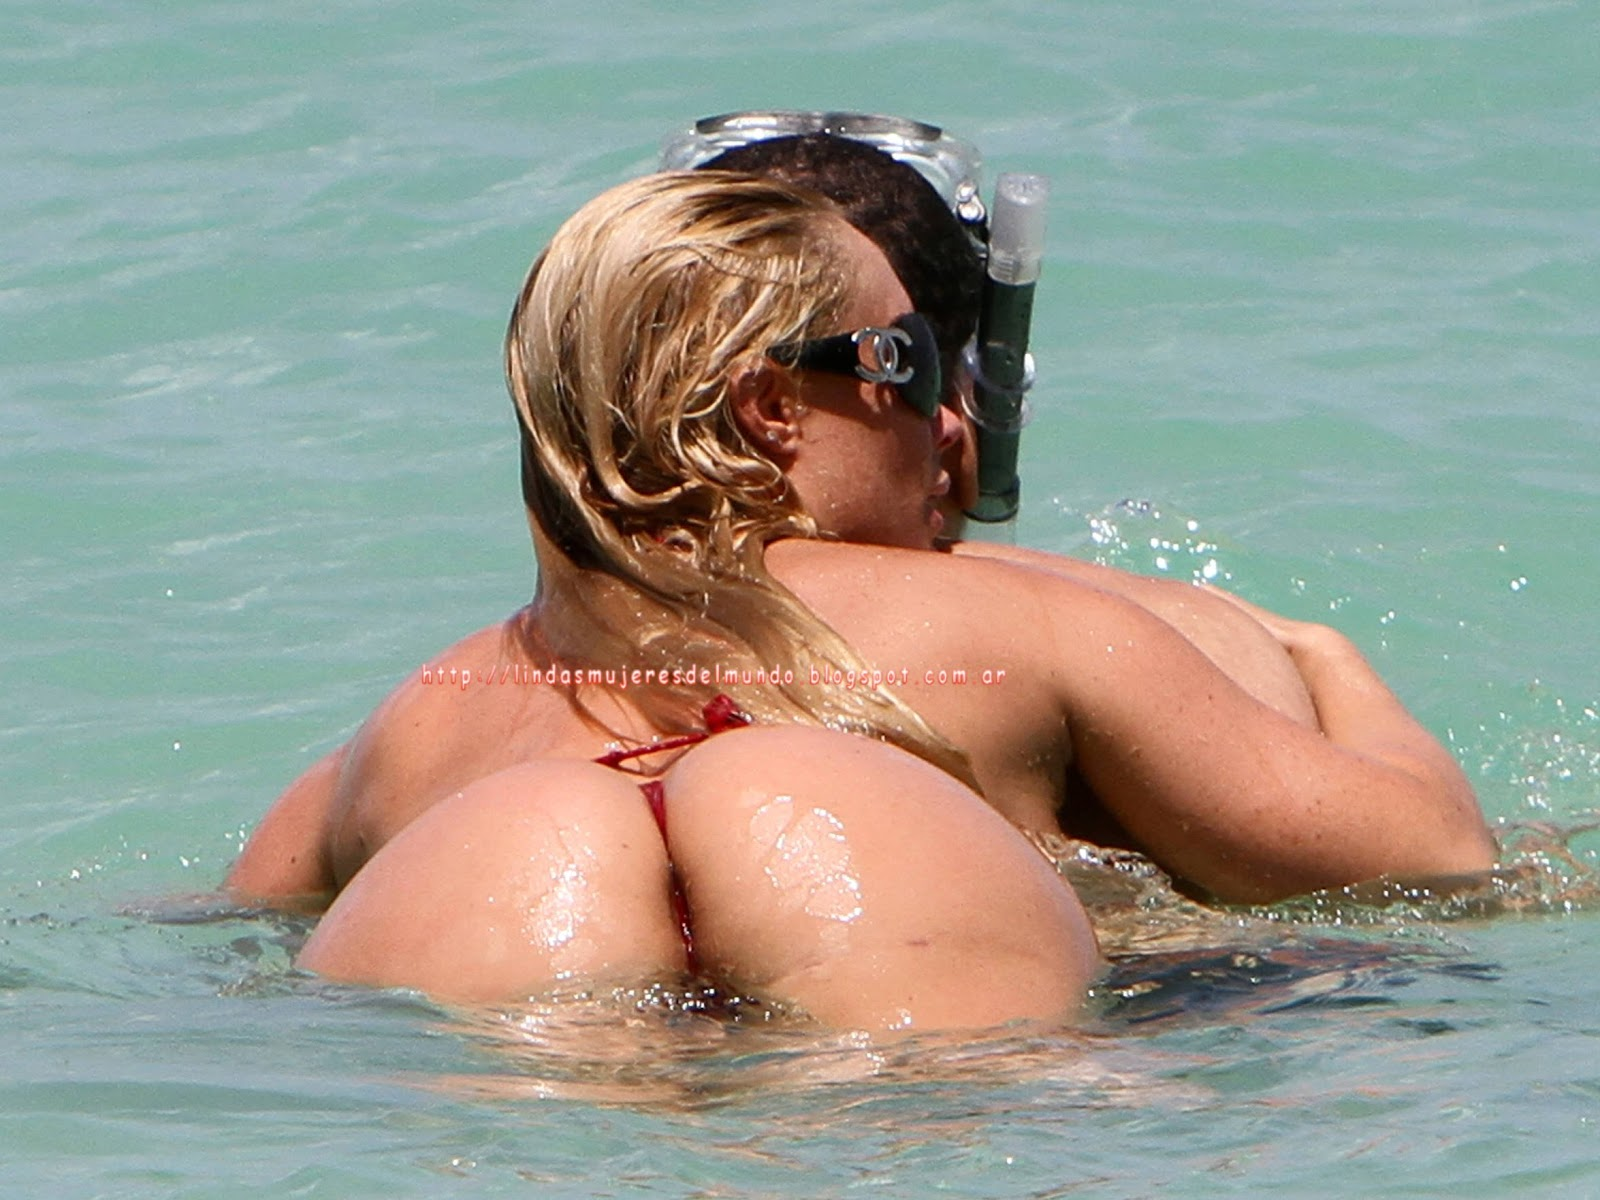 Jennifer anderson nude pic